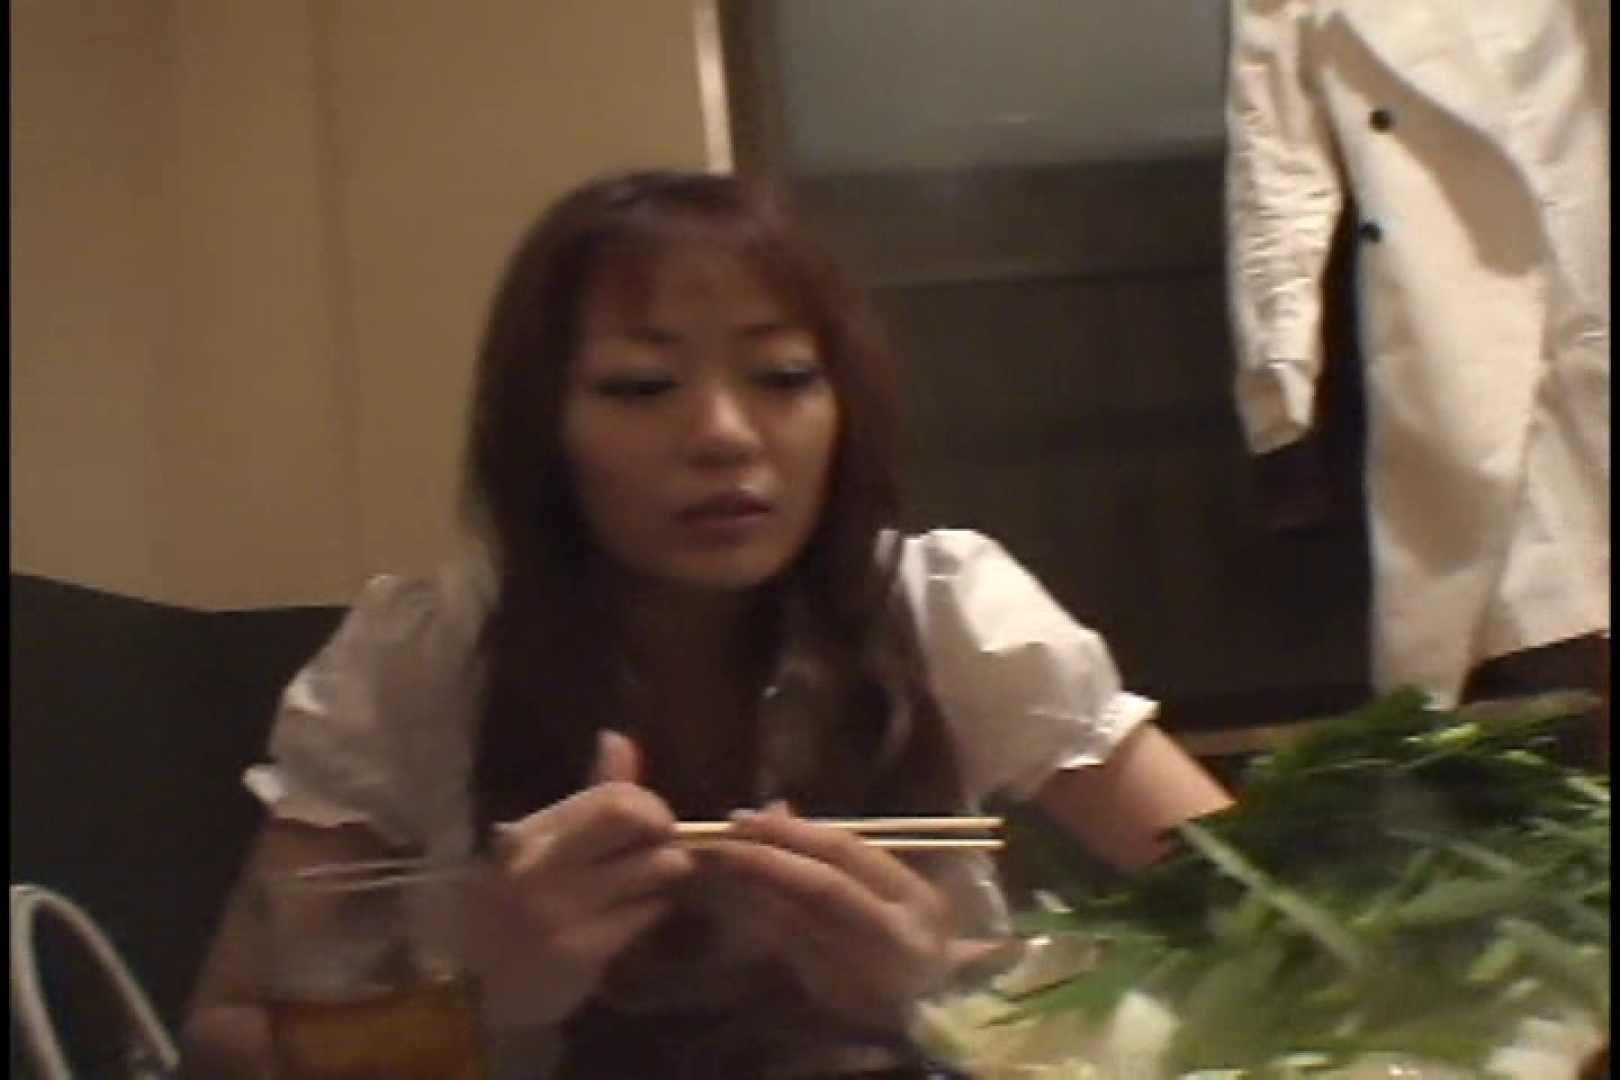 JDハンター全国ツアー vol.001 後編 女子大生のエロ動画   0  81PIX 1